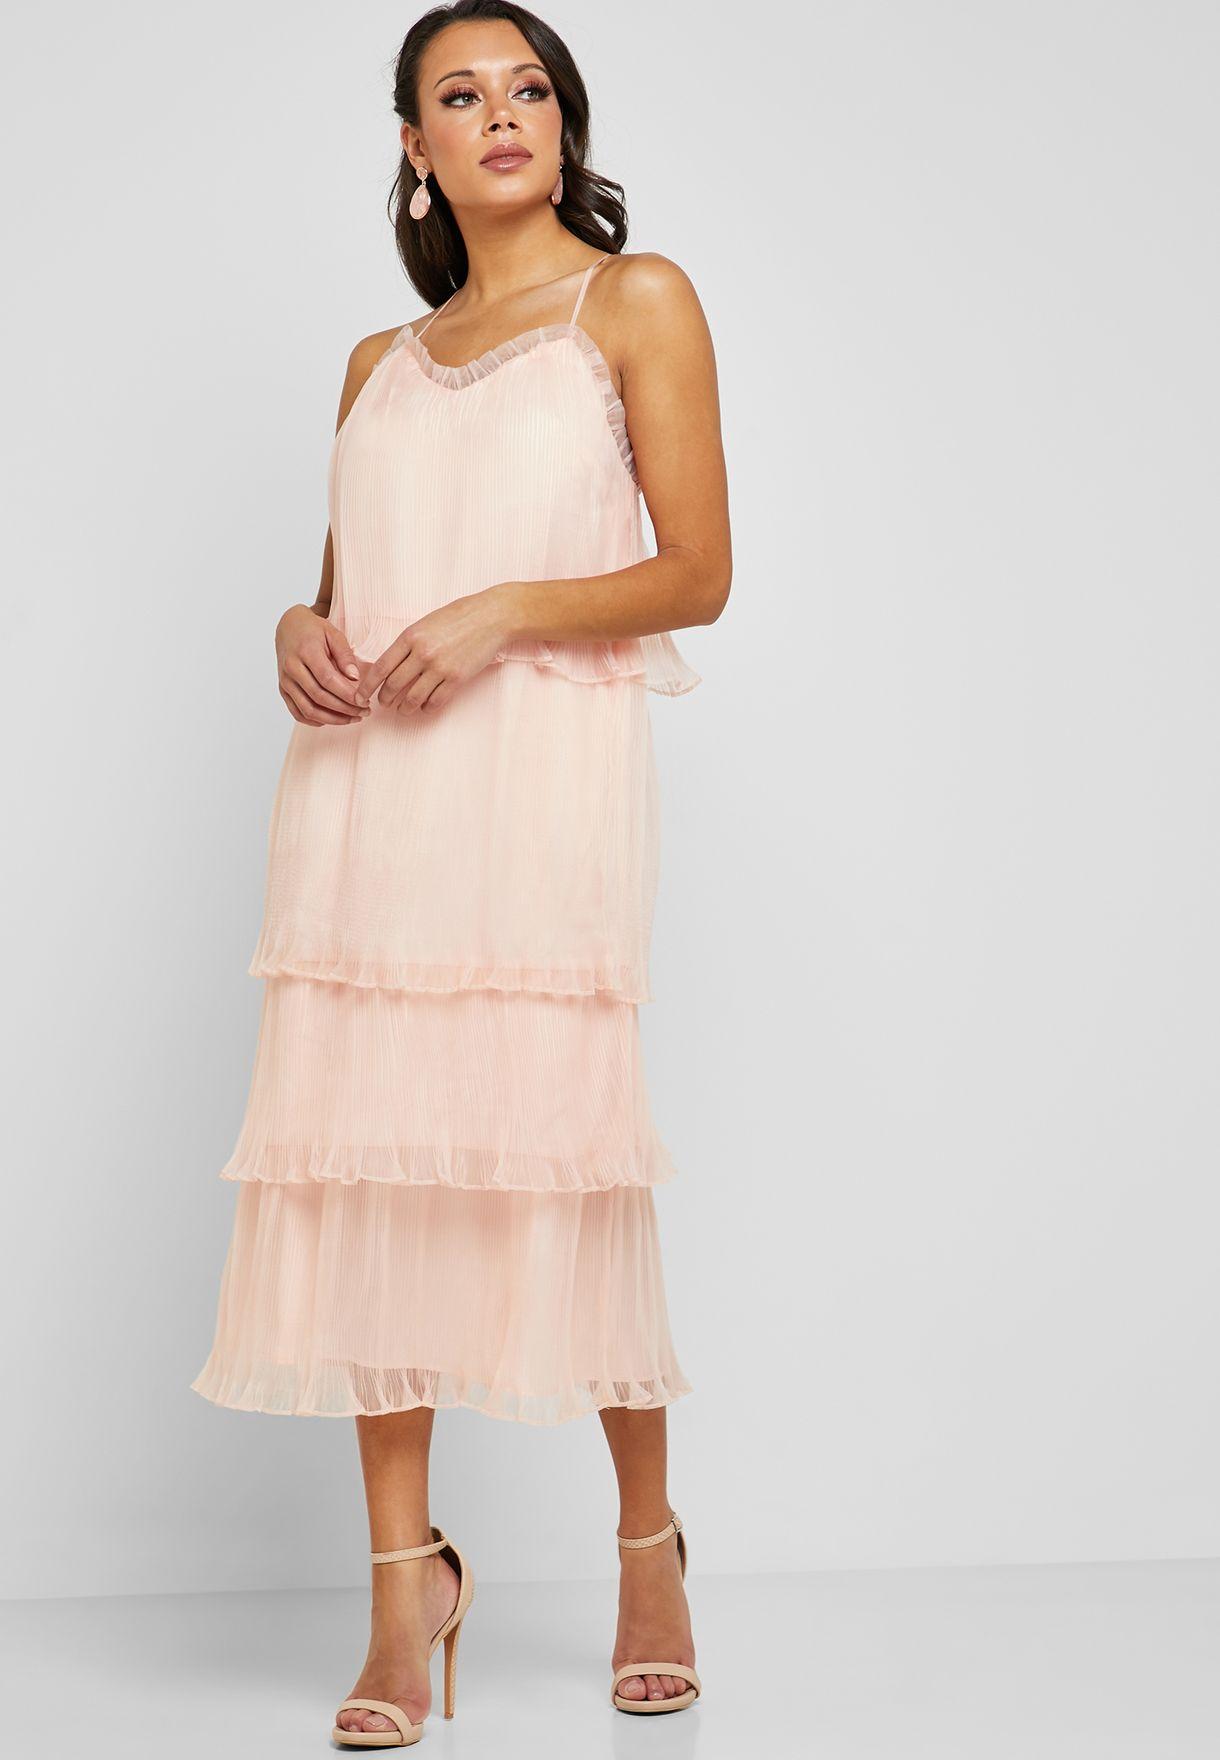 فستان بحمالات وكشكش